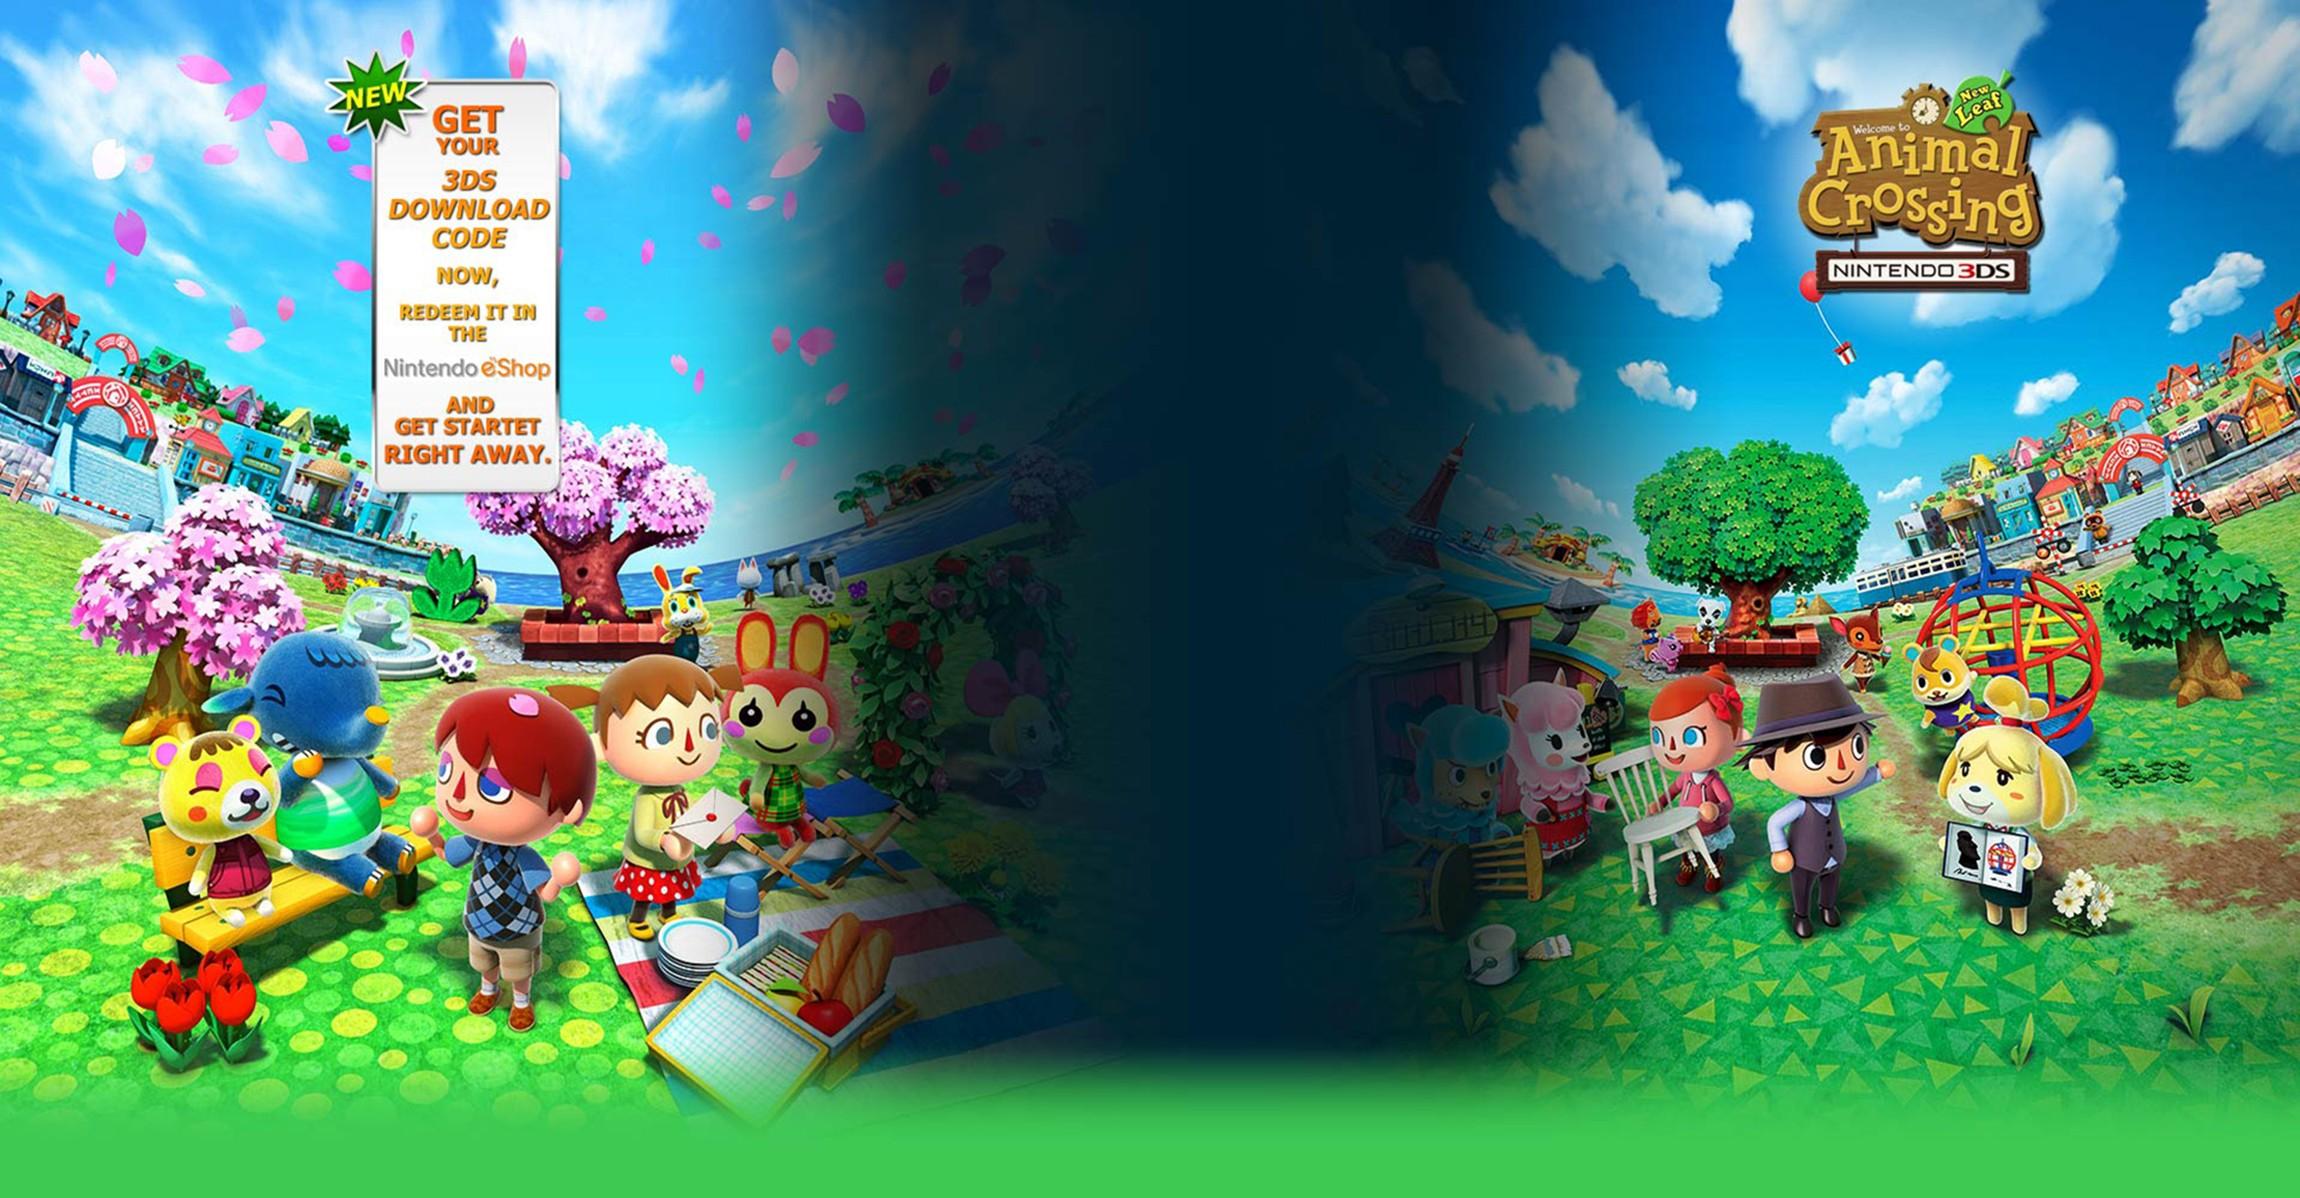 3ds Animal Crossing New Leaf Download Code Free Download Rar